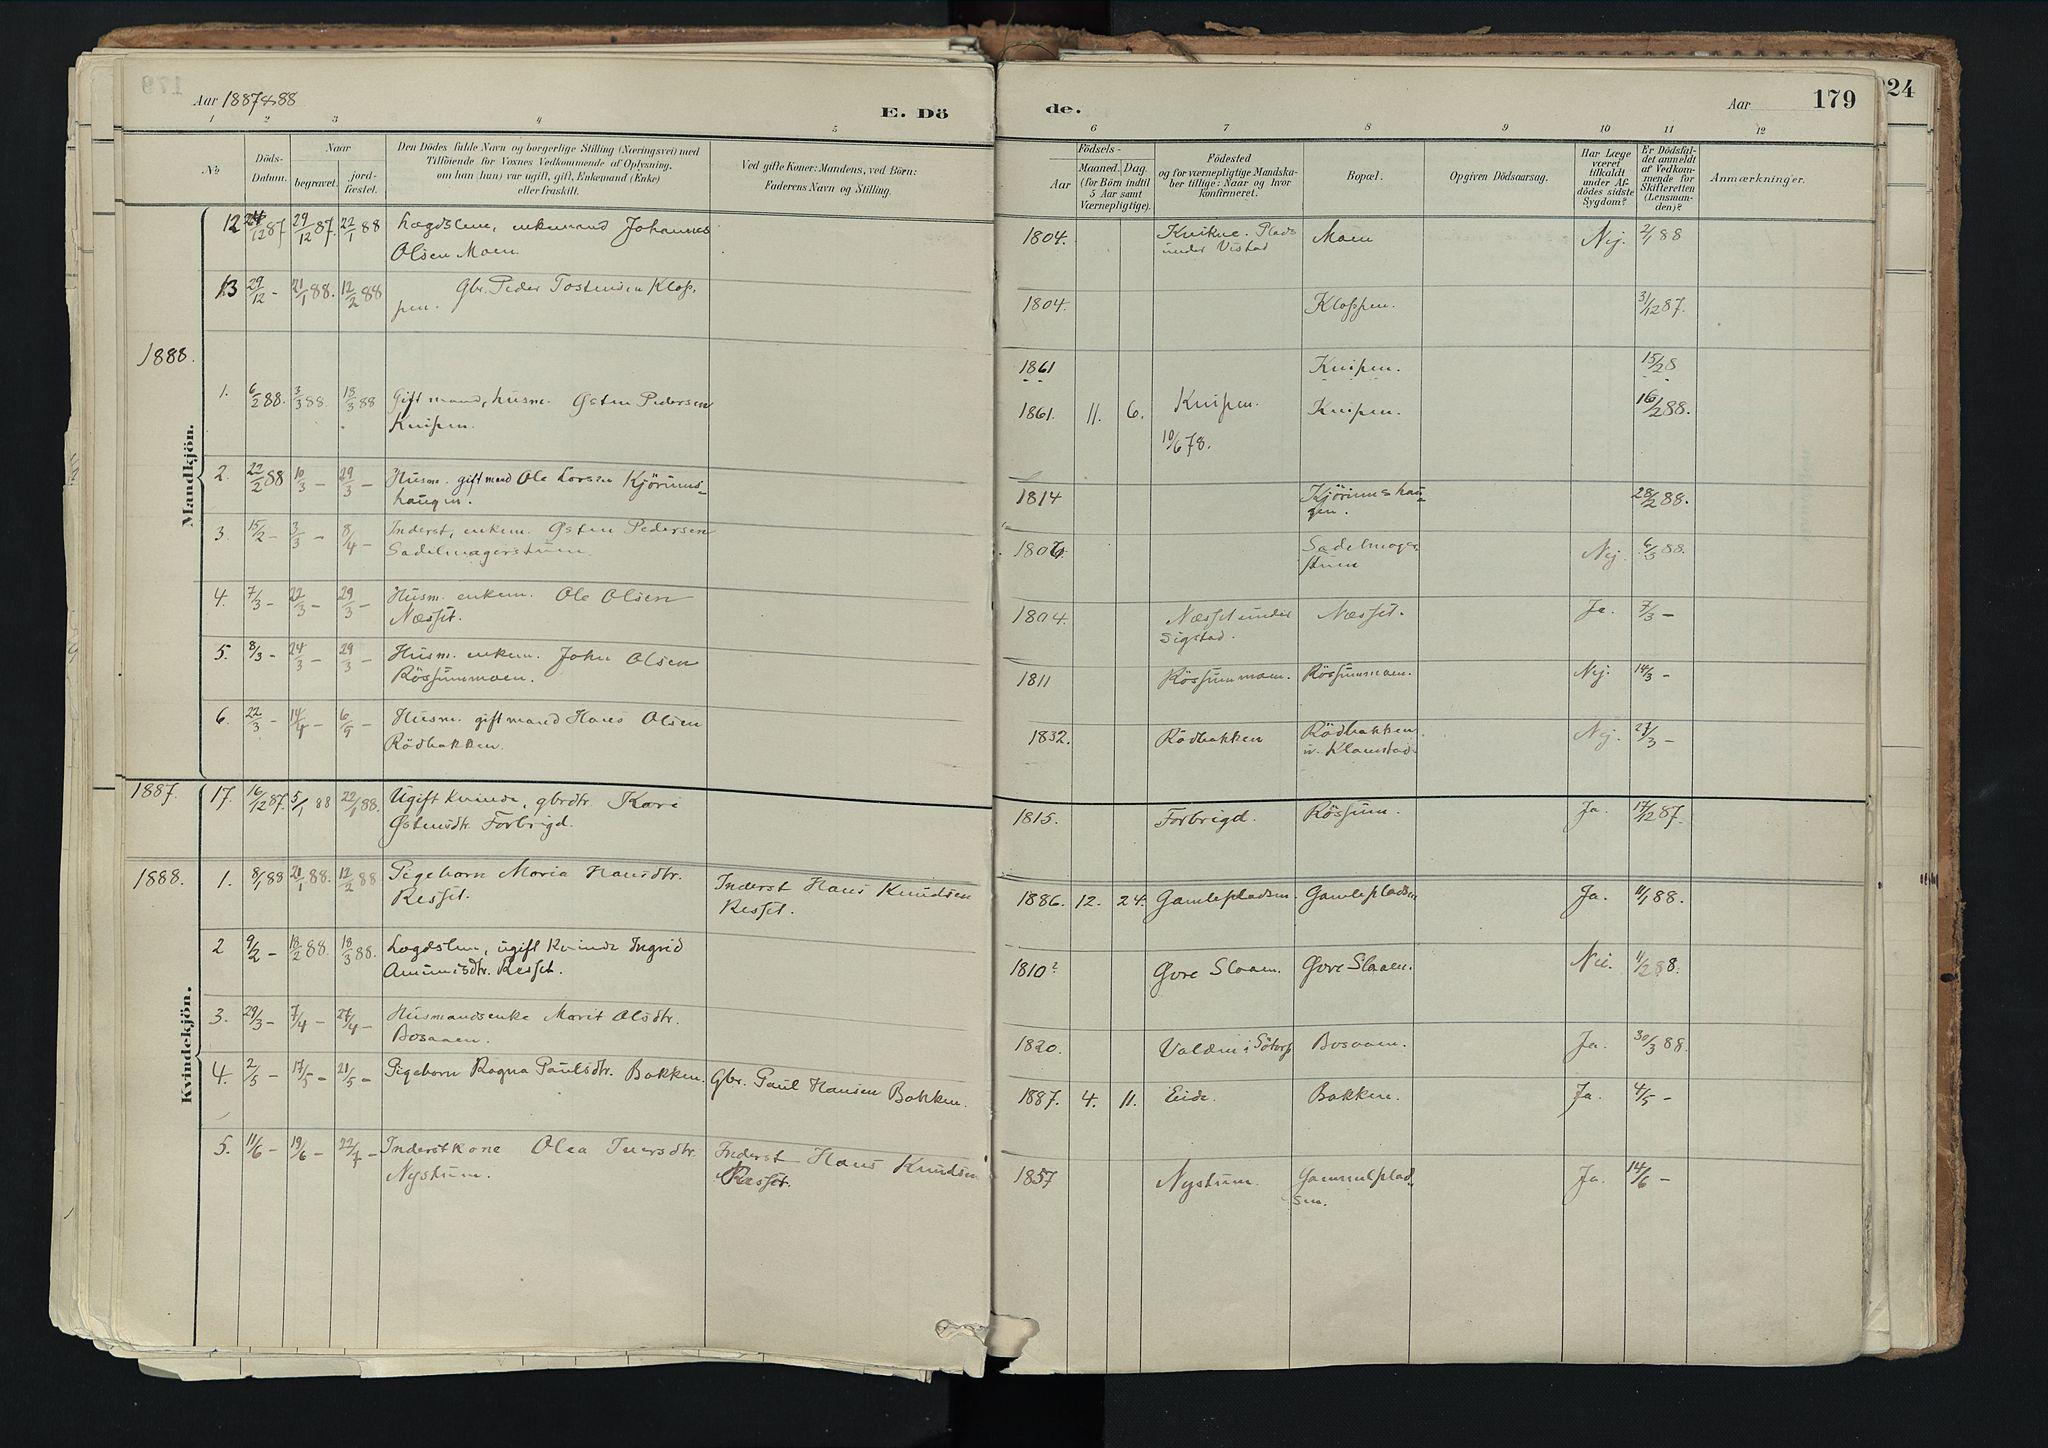 SAH, Nord-Fron prestekontor, Ministerialbok nr. 3, 1884-1914, s. 179